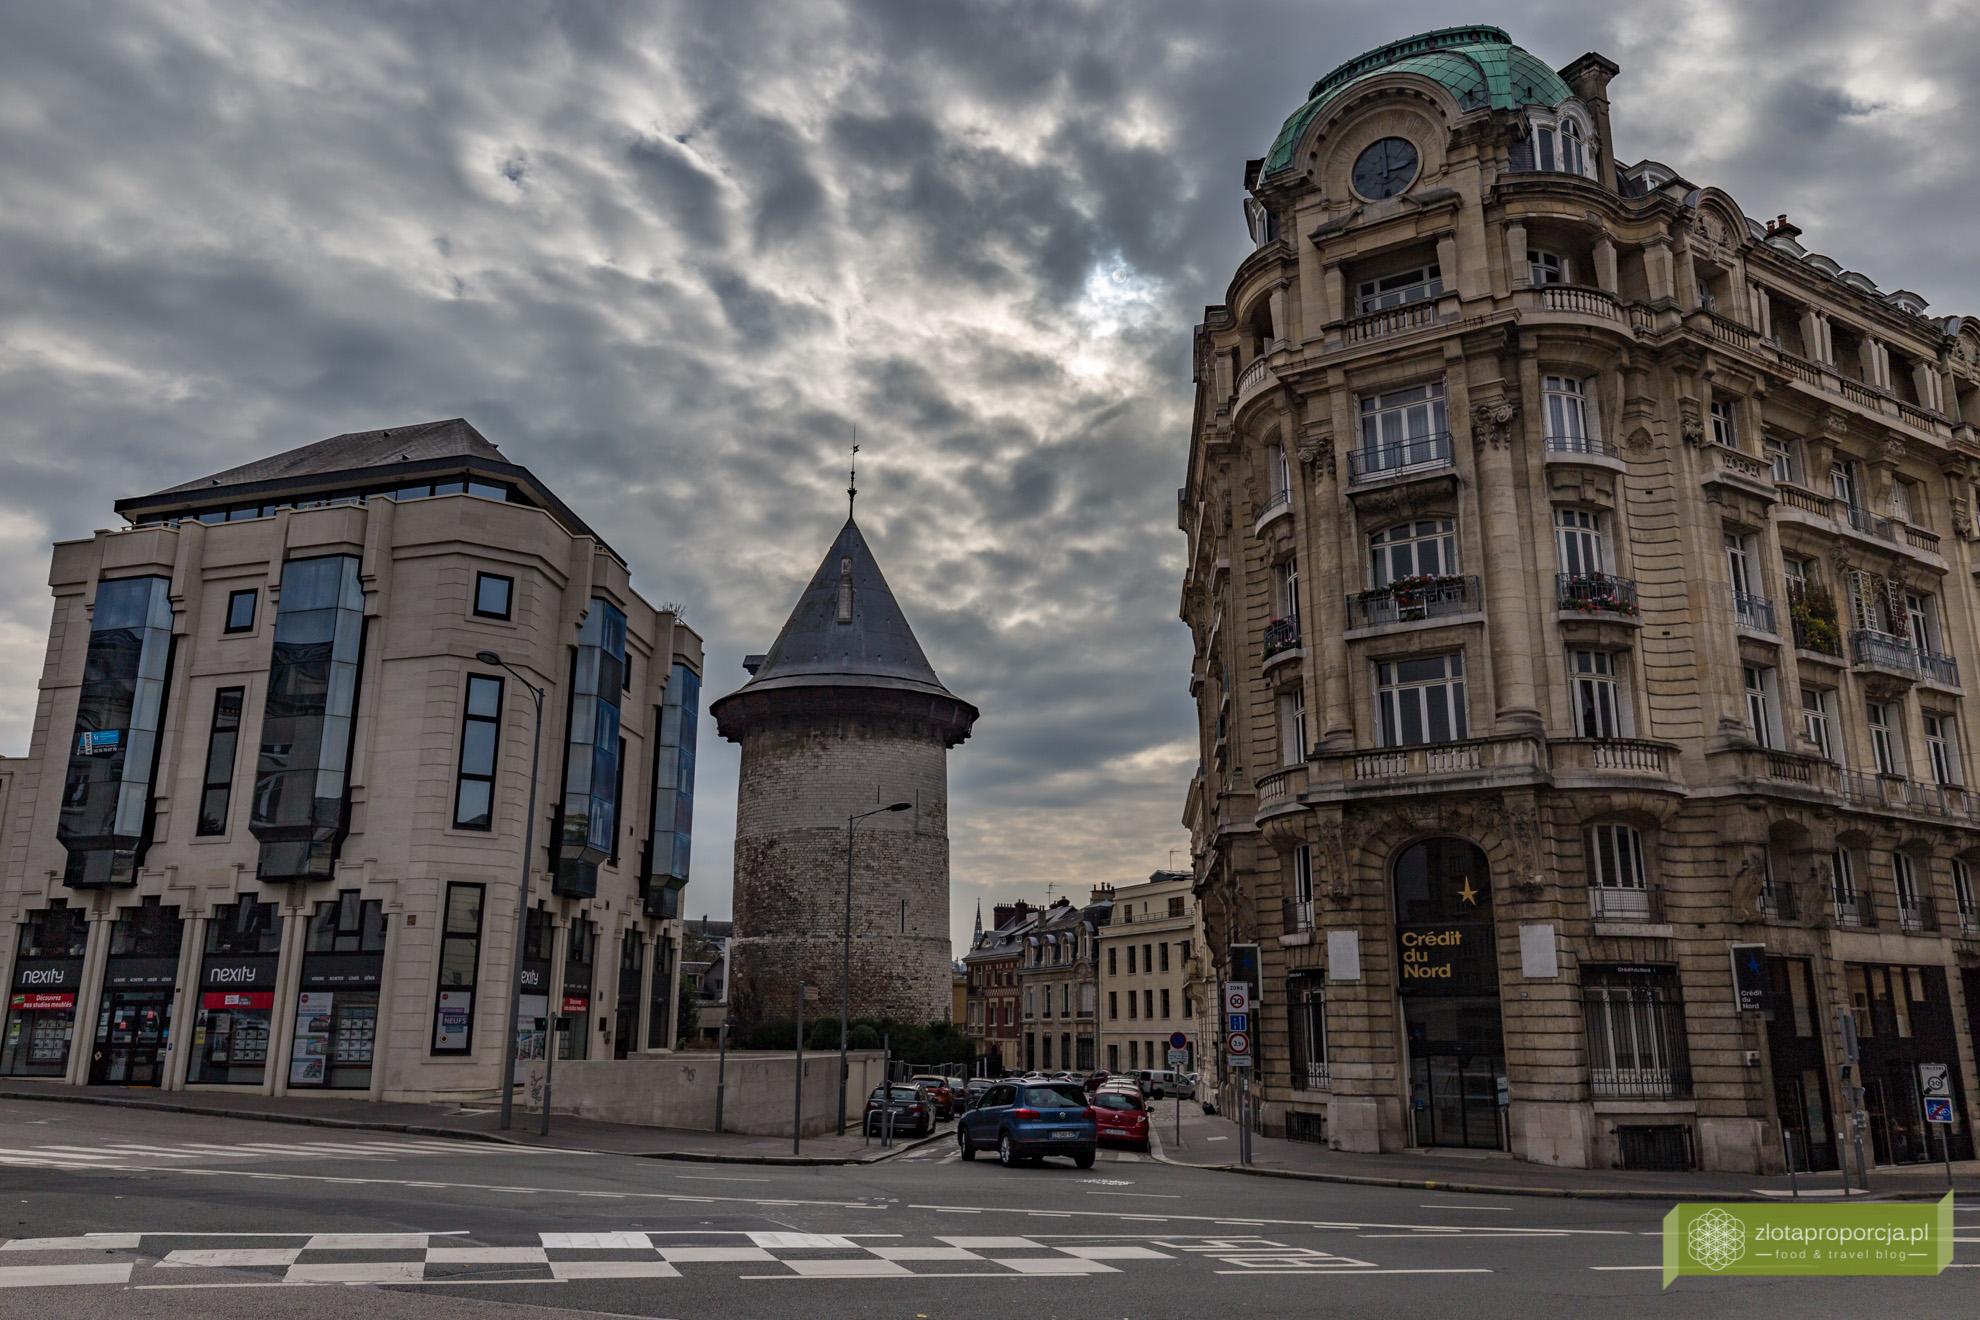 Rouen,vNormandia, atrakcje Rouen, atrakcje Normandii, Francja, Joanna D'arc